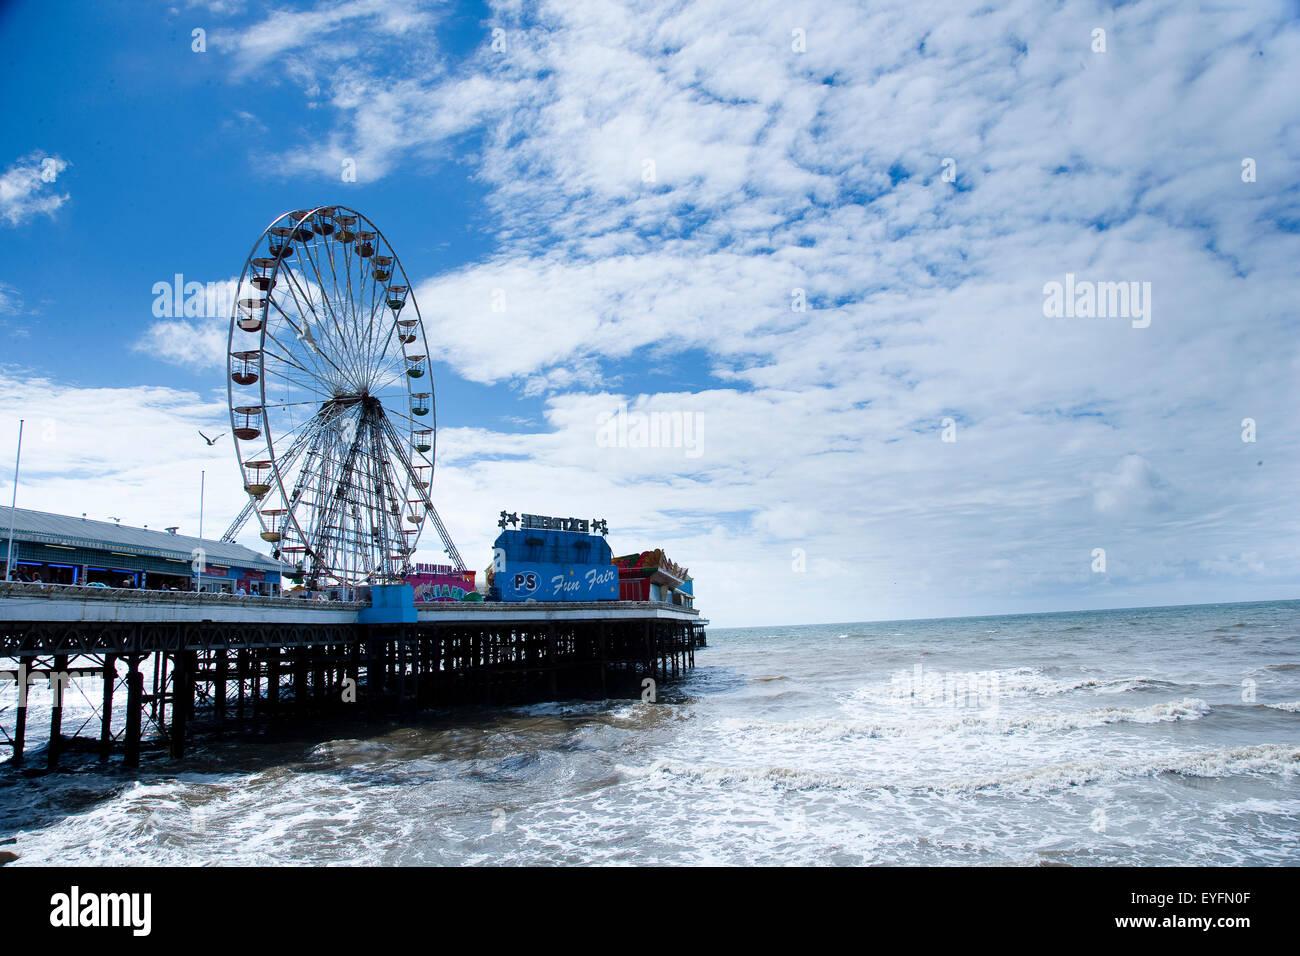 Blackpool central pier reaches out into the sea, Blackpool Pleasure beach; Blackpool, Lancashire, England - Stock Image